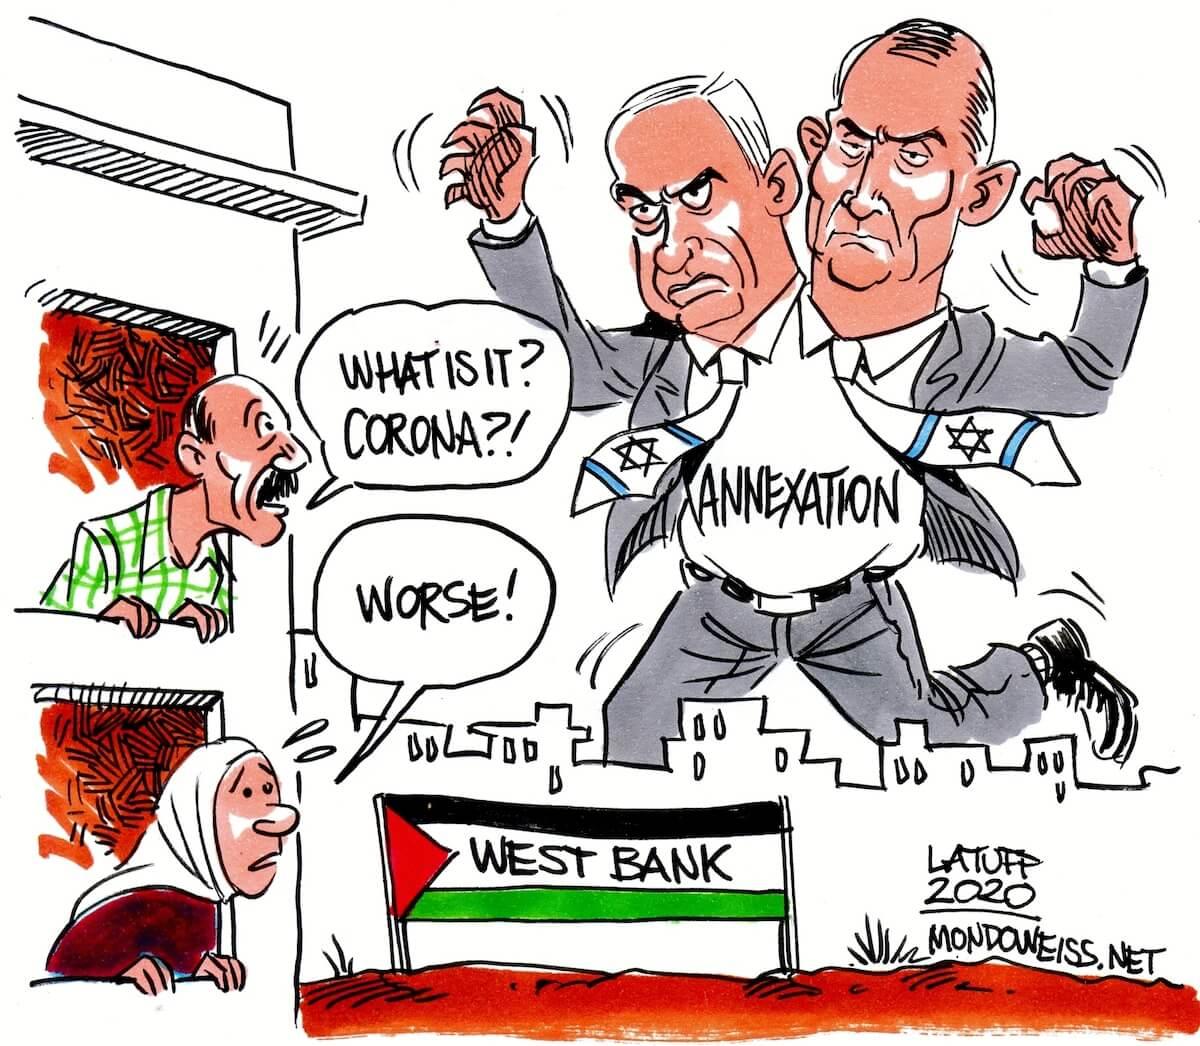 The Netanyahu/Gantz unity government. (Cartoon: Carlos Latuff)